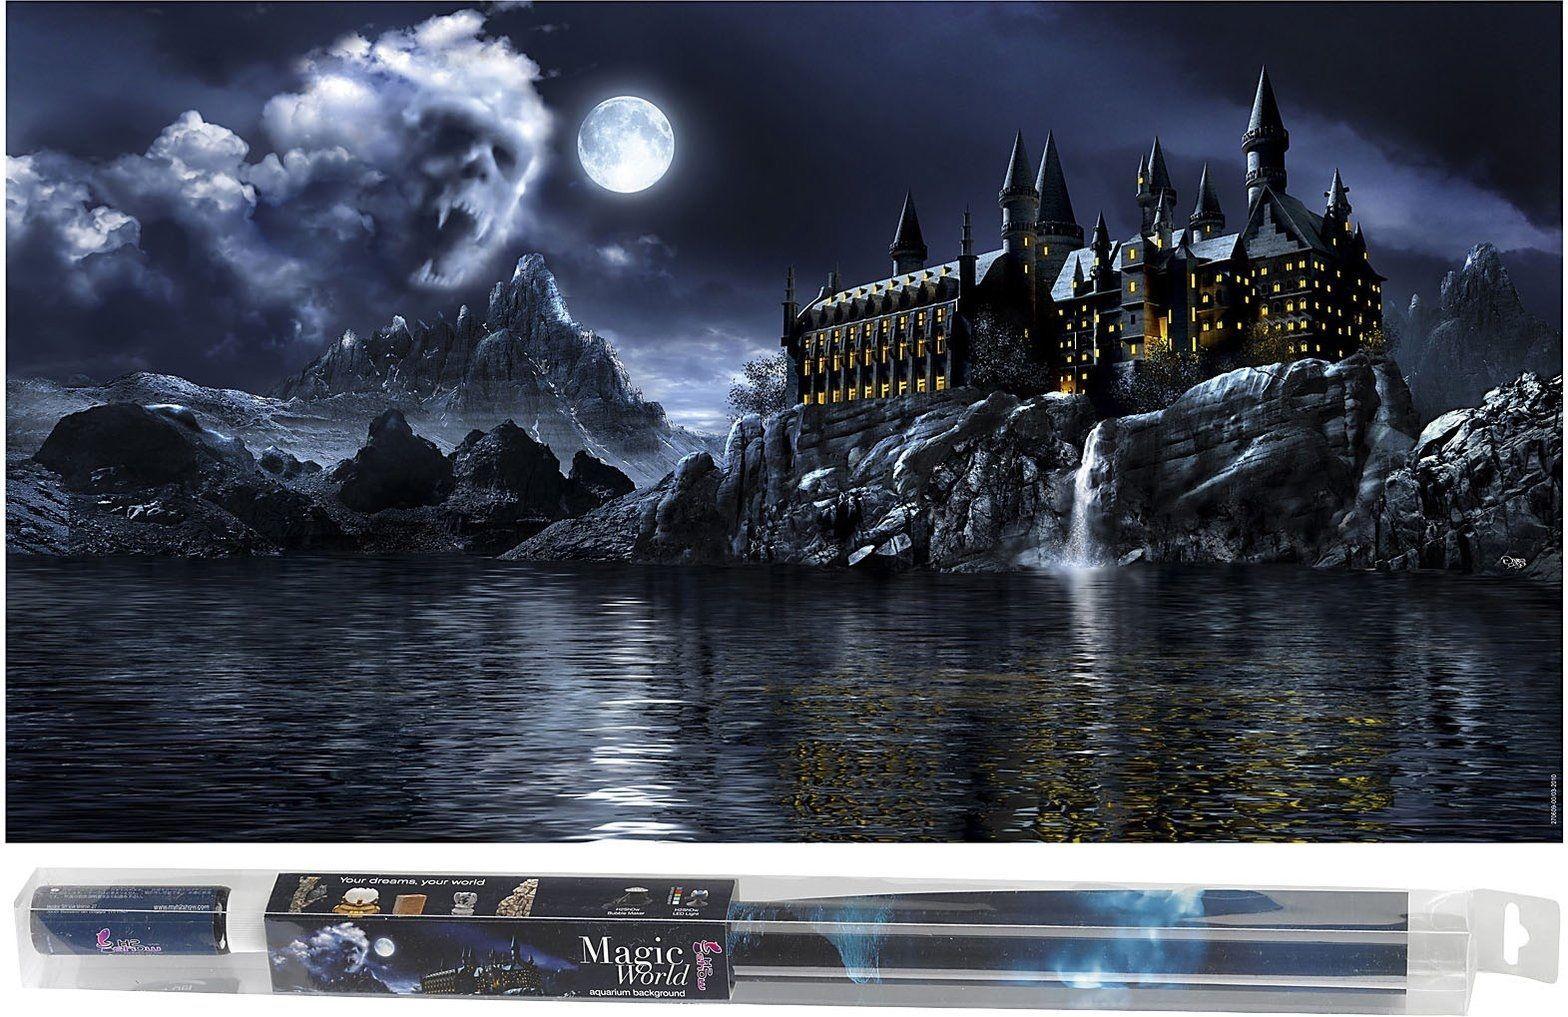 Hydor HYDOR H2shOw Magic World - tlo 80 x 40 cm + zel 1105455